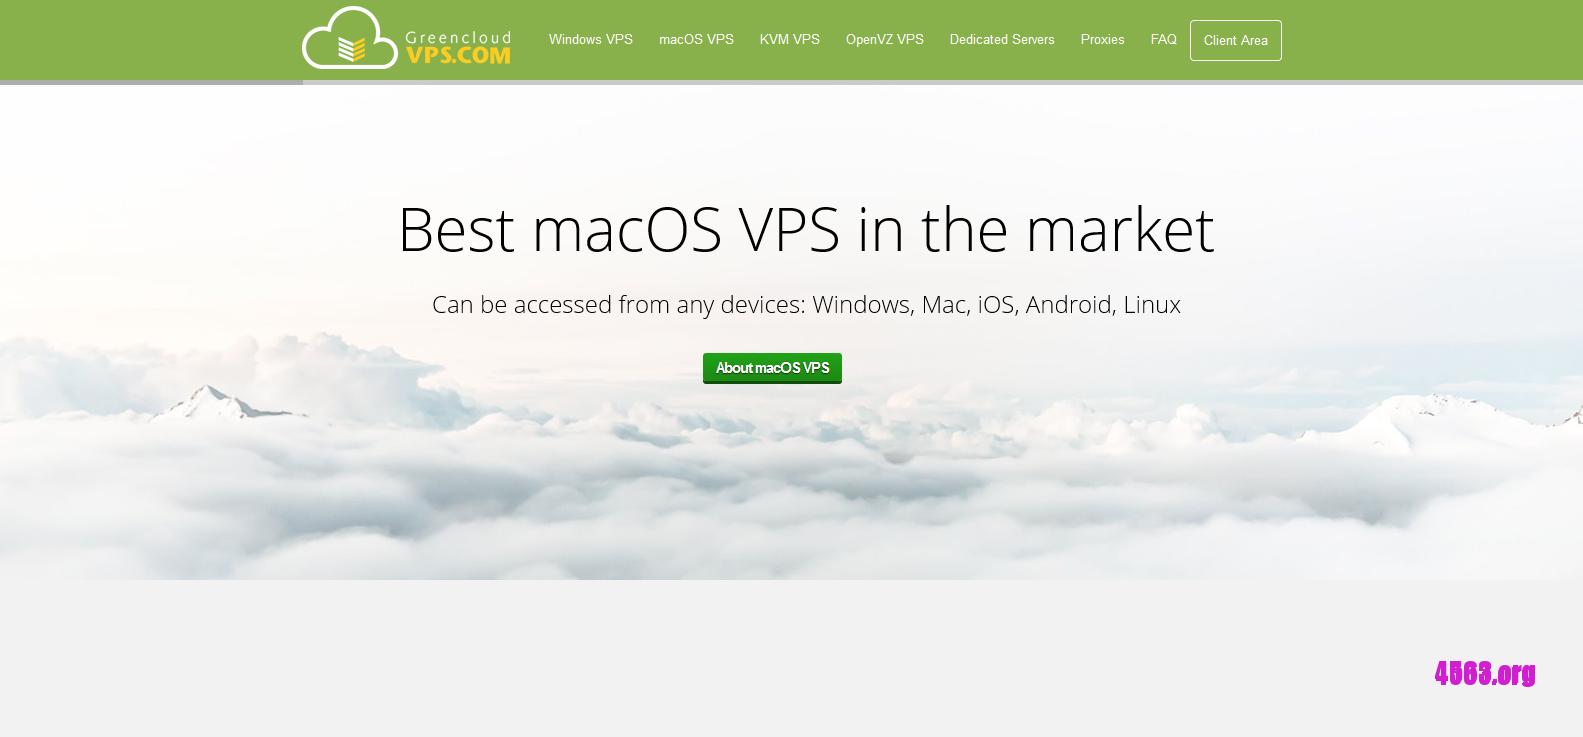 CloudXMAC洛杉矶/越南VPS@2GB内存/40GB SSD空间/不限流量/1Gbps/macOS@$22/月